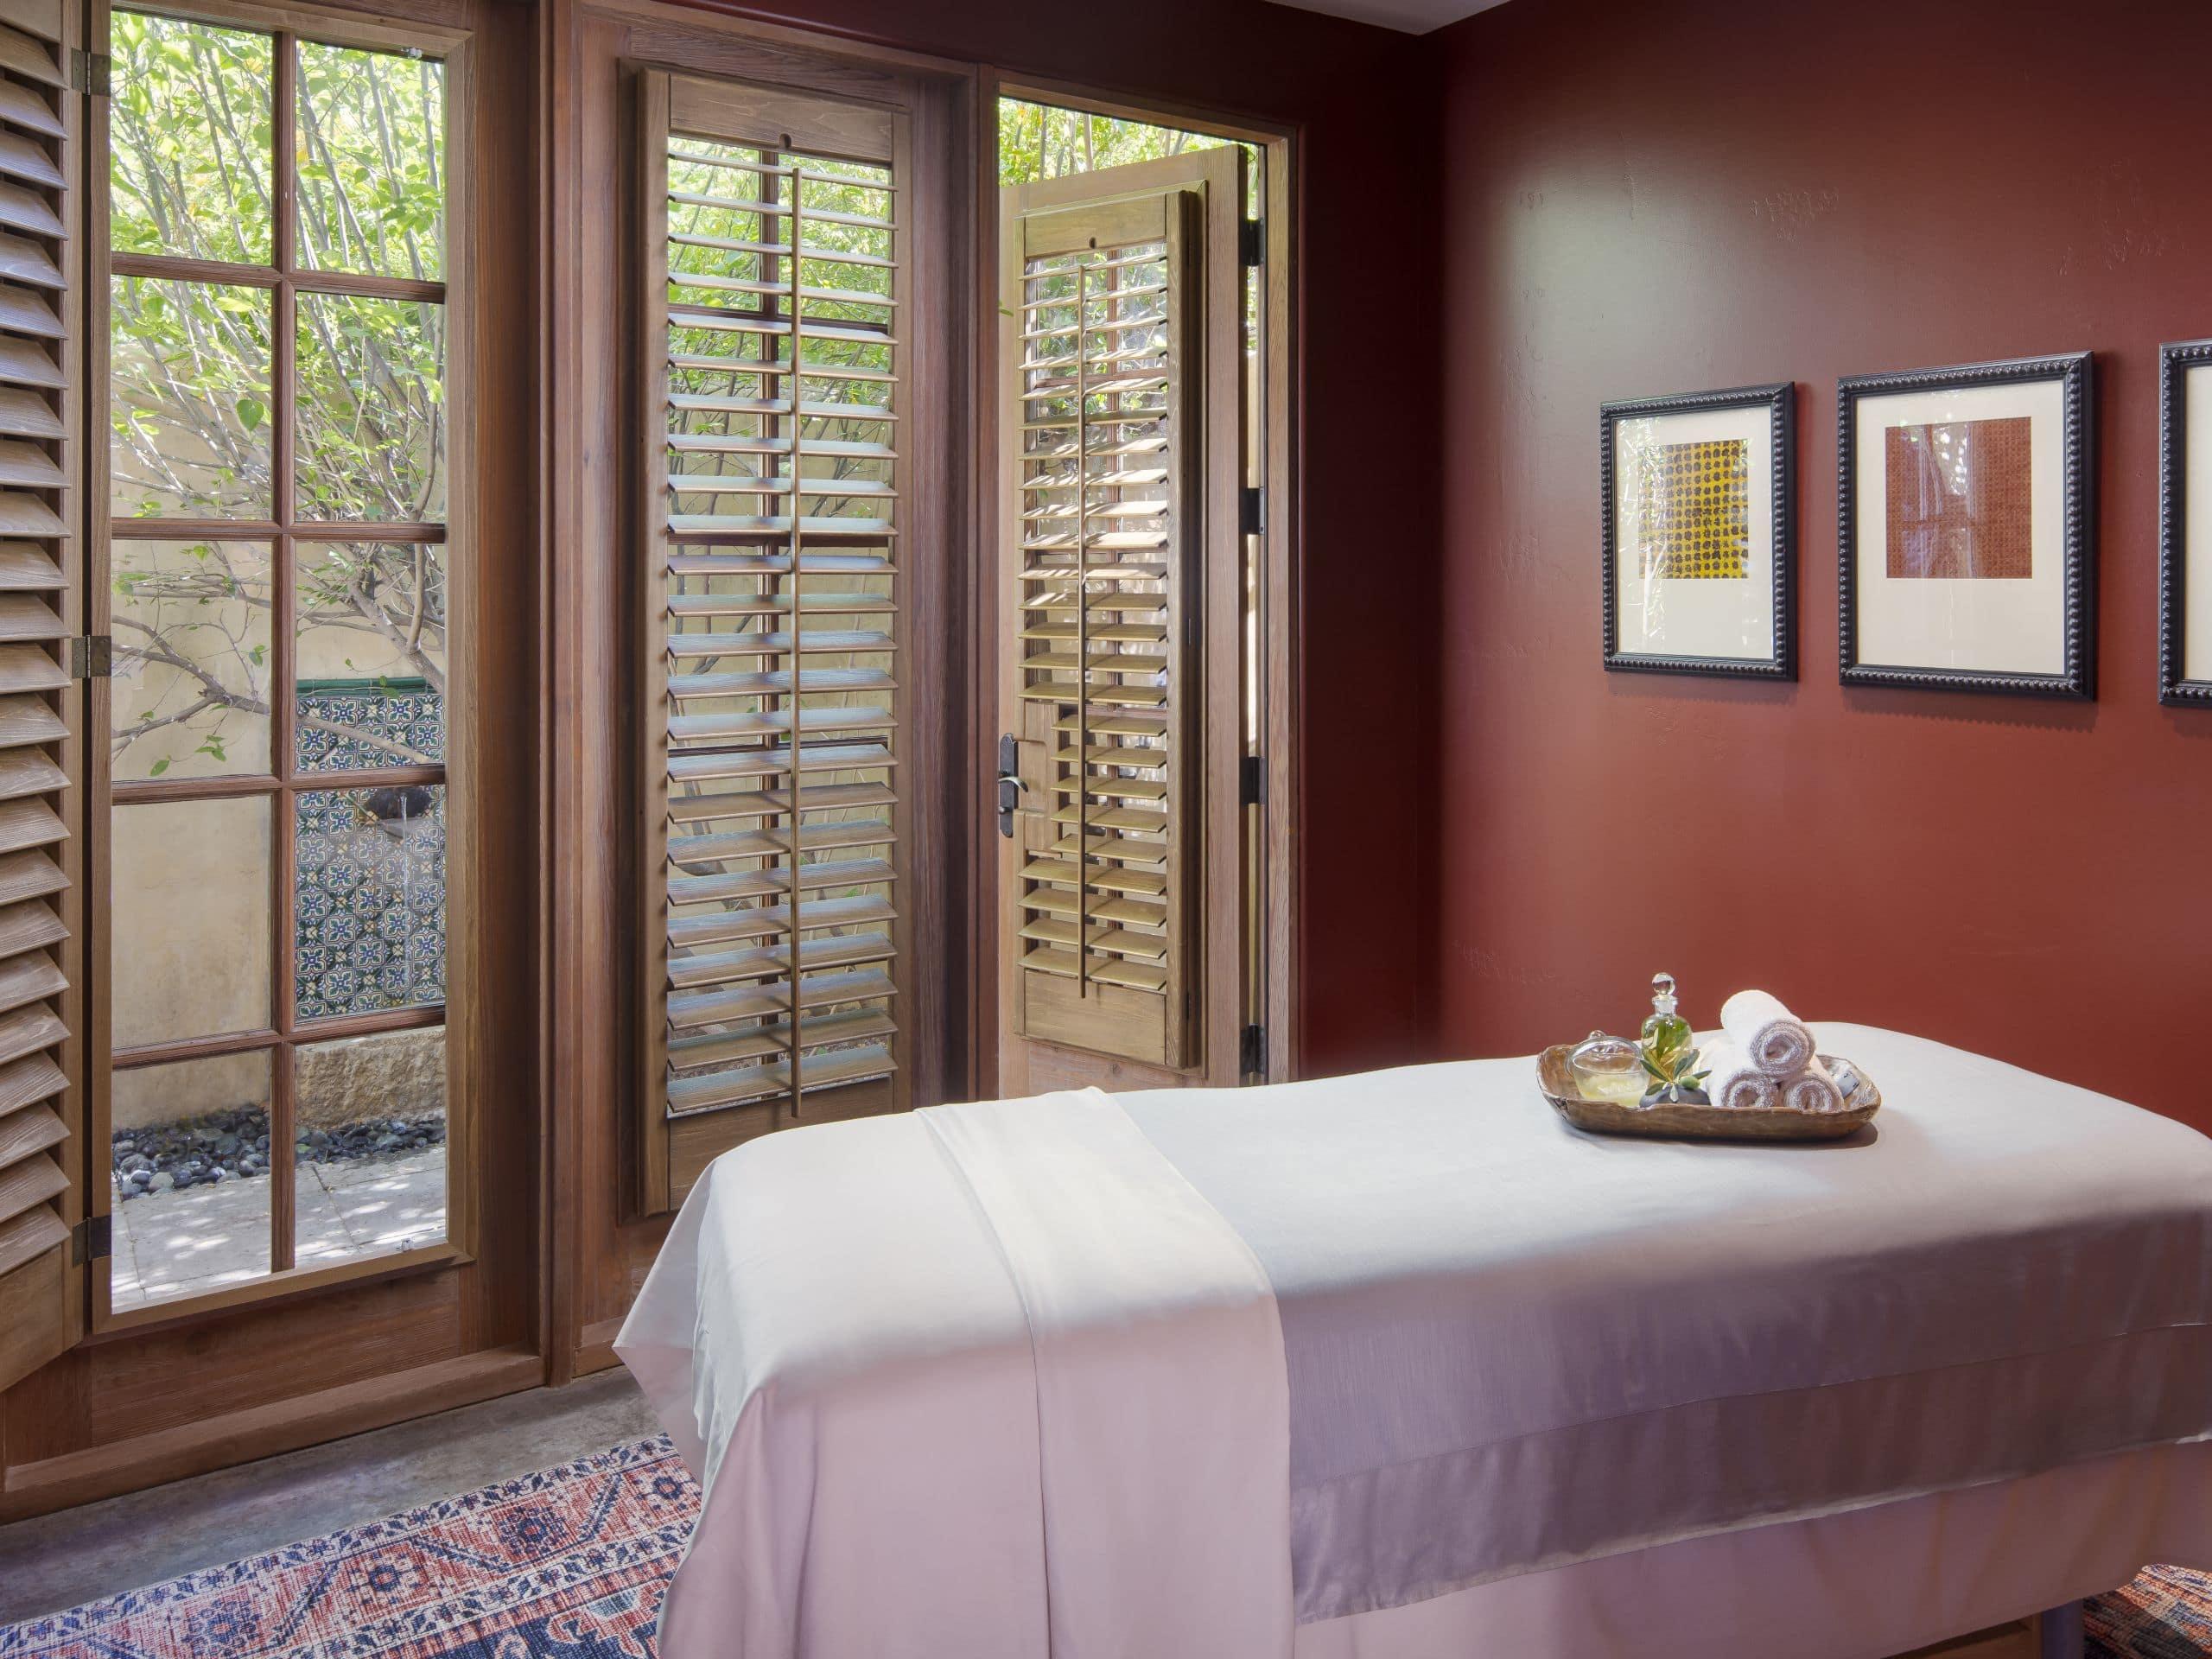 Alvadora Spa Sole Treatment Room